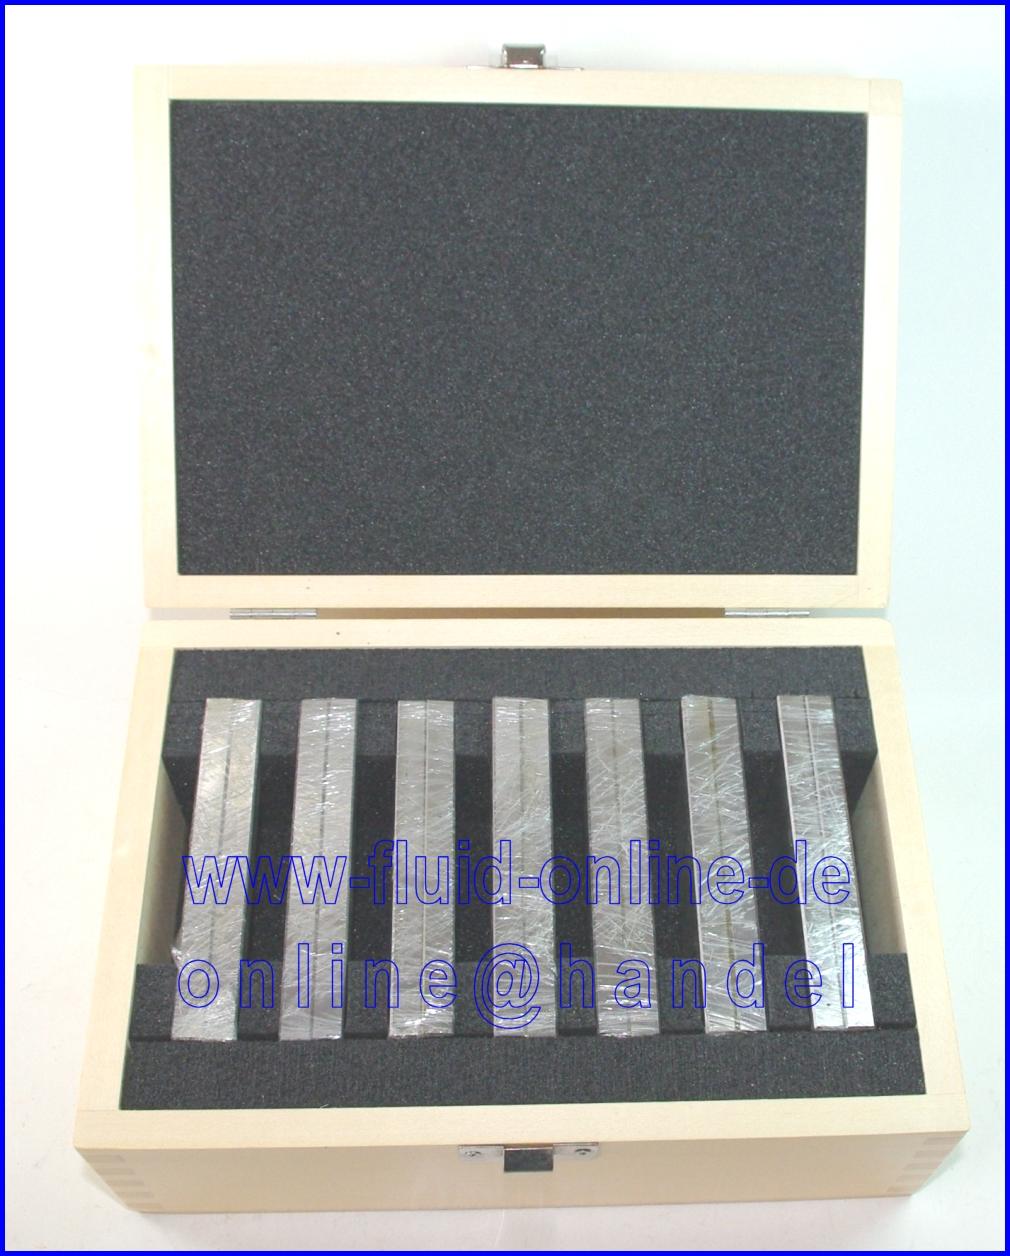 proxxon 24266 parallelunterlagen 14 teiliges set neu ebay. Black Bedroom Furniture Sets. Home Design Ideas